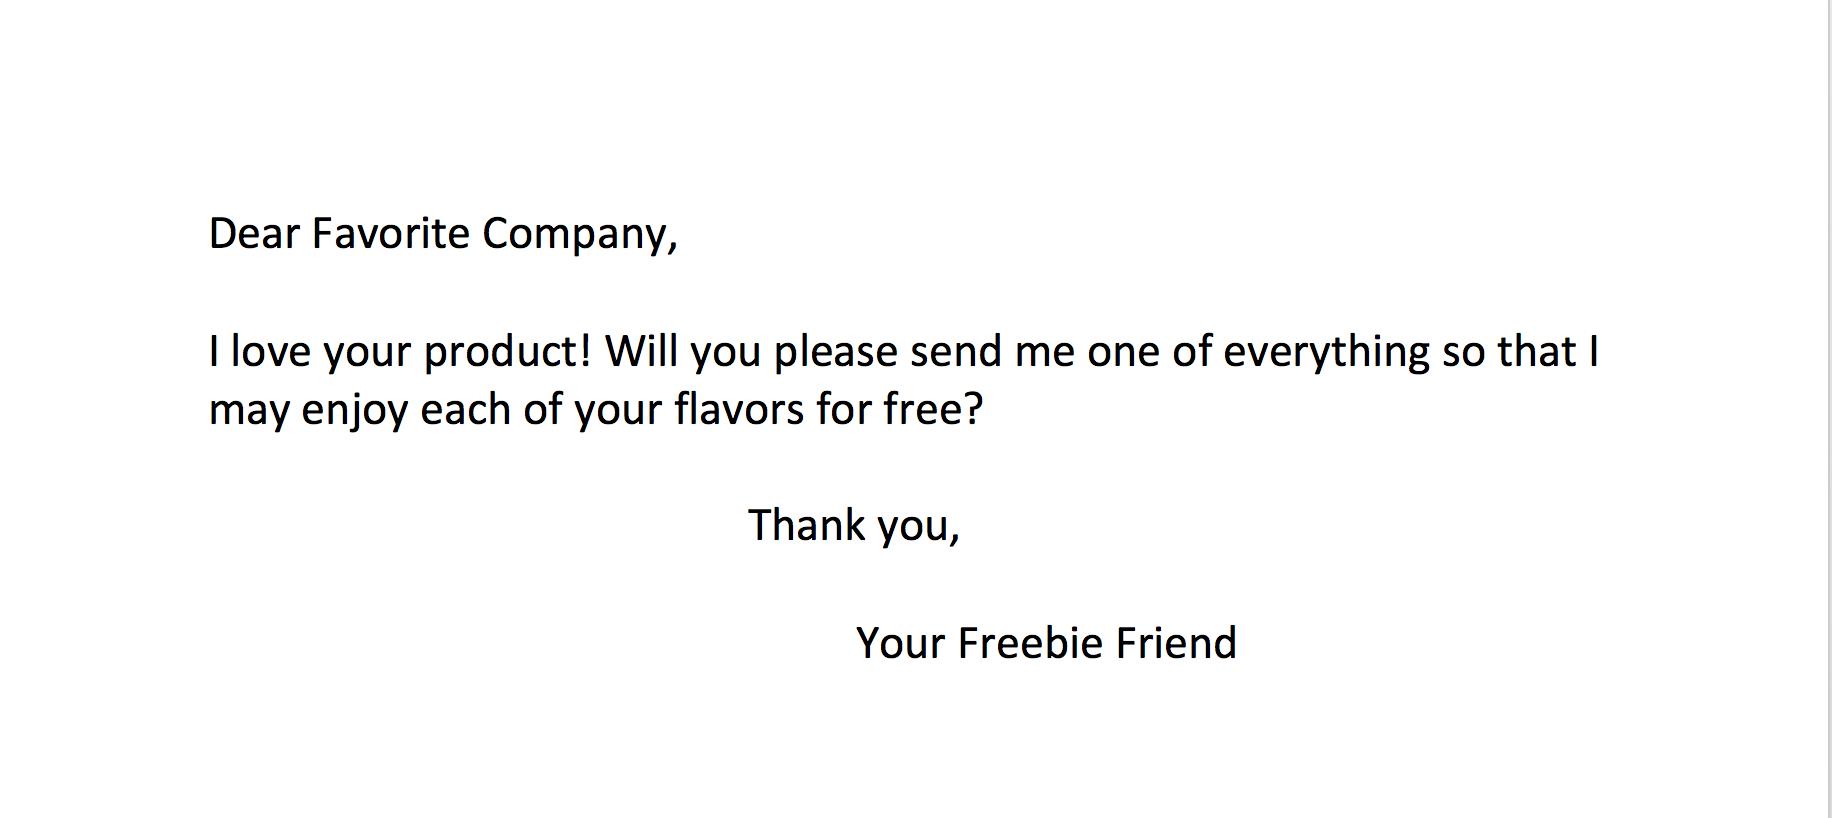 free stuff mail